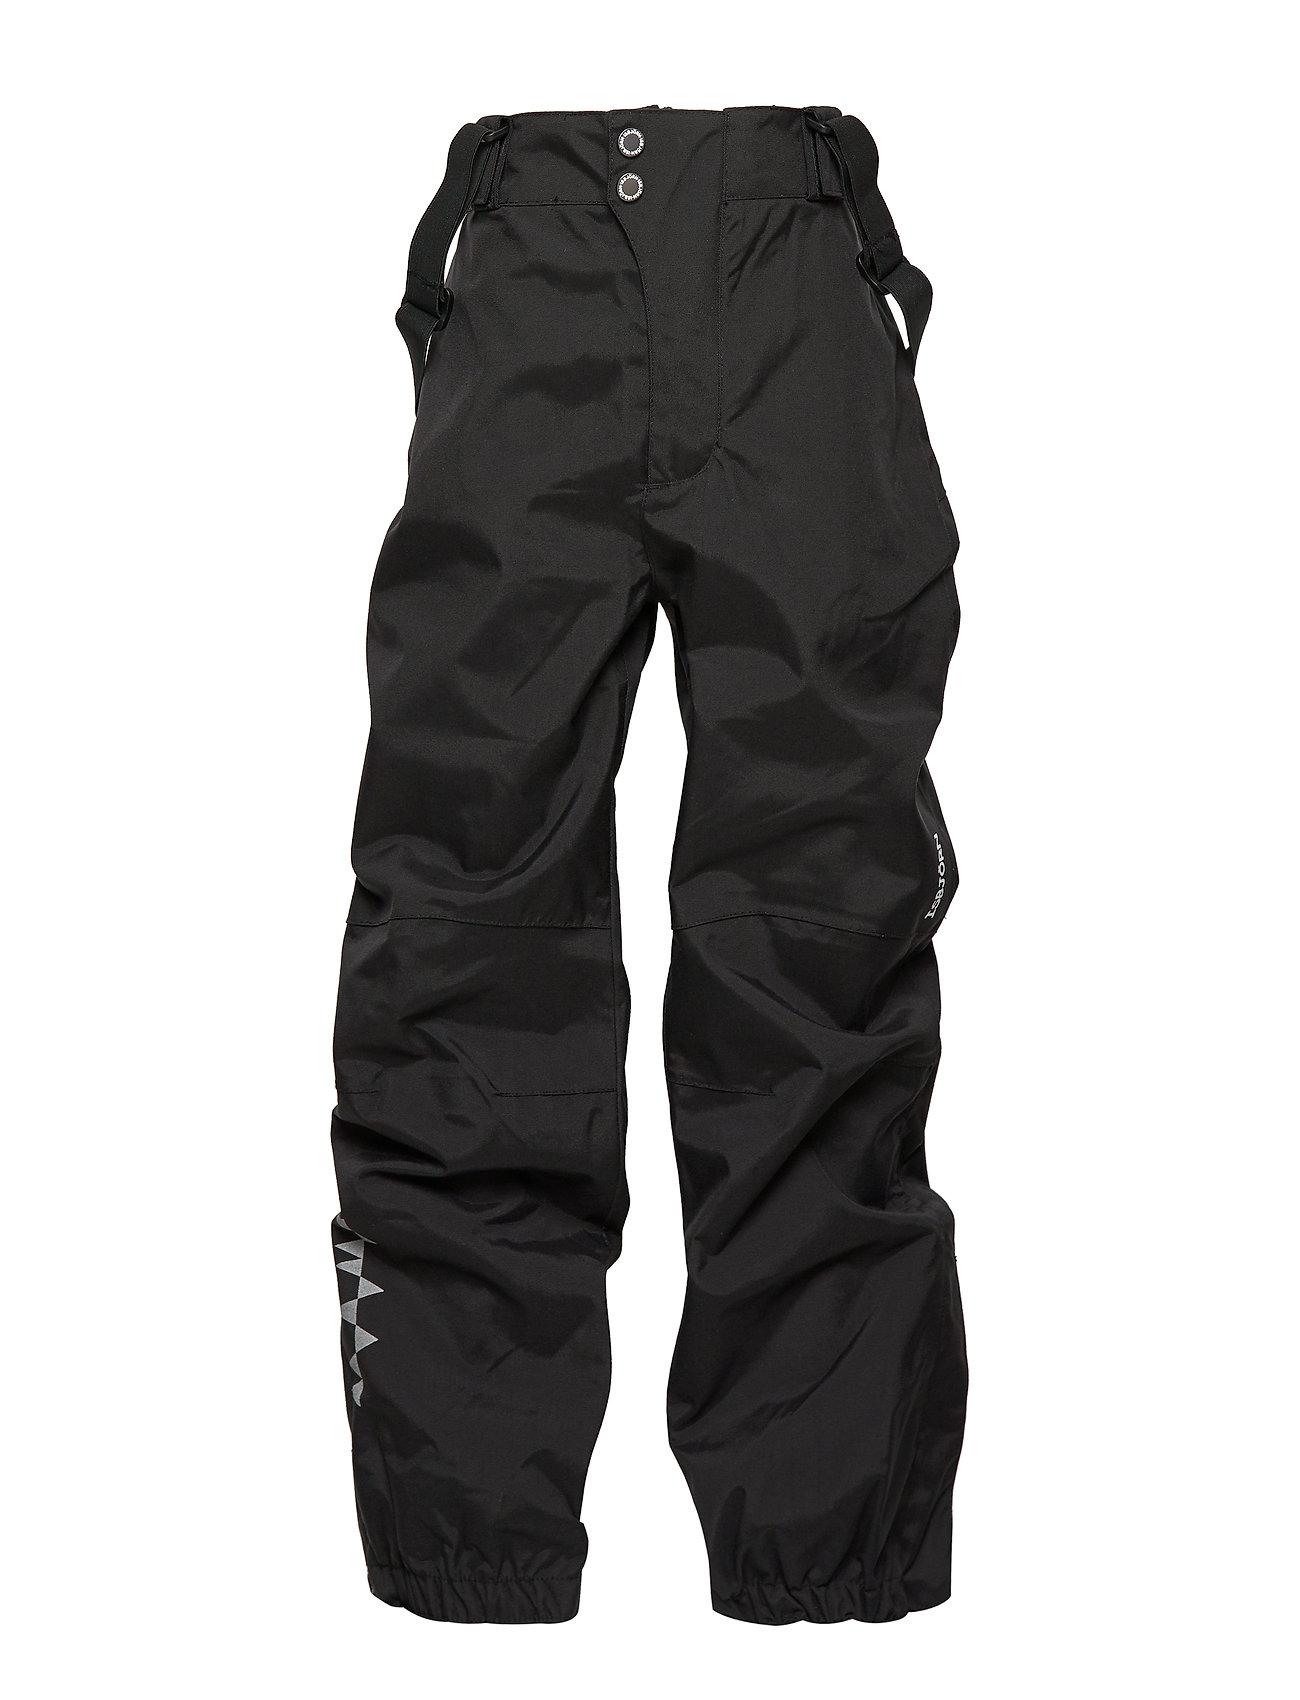 Isbjörn Hurricane Hard Shell Pants Barn black